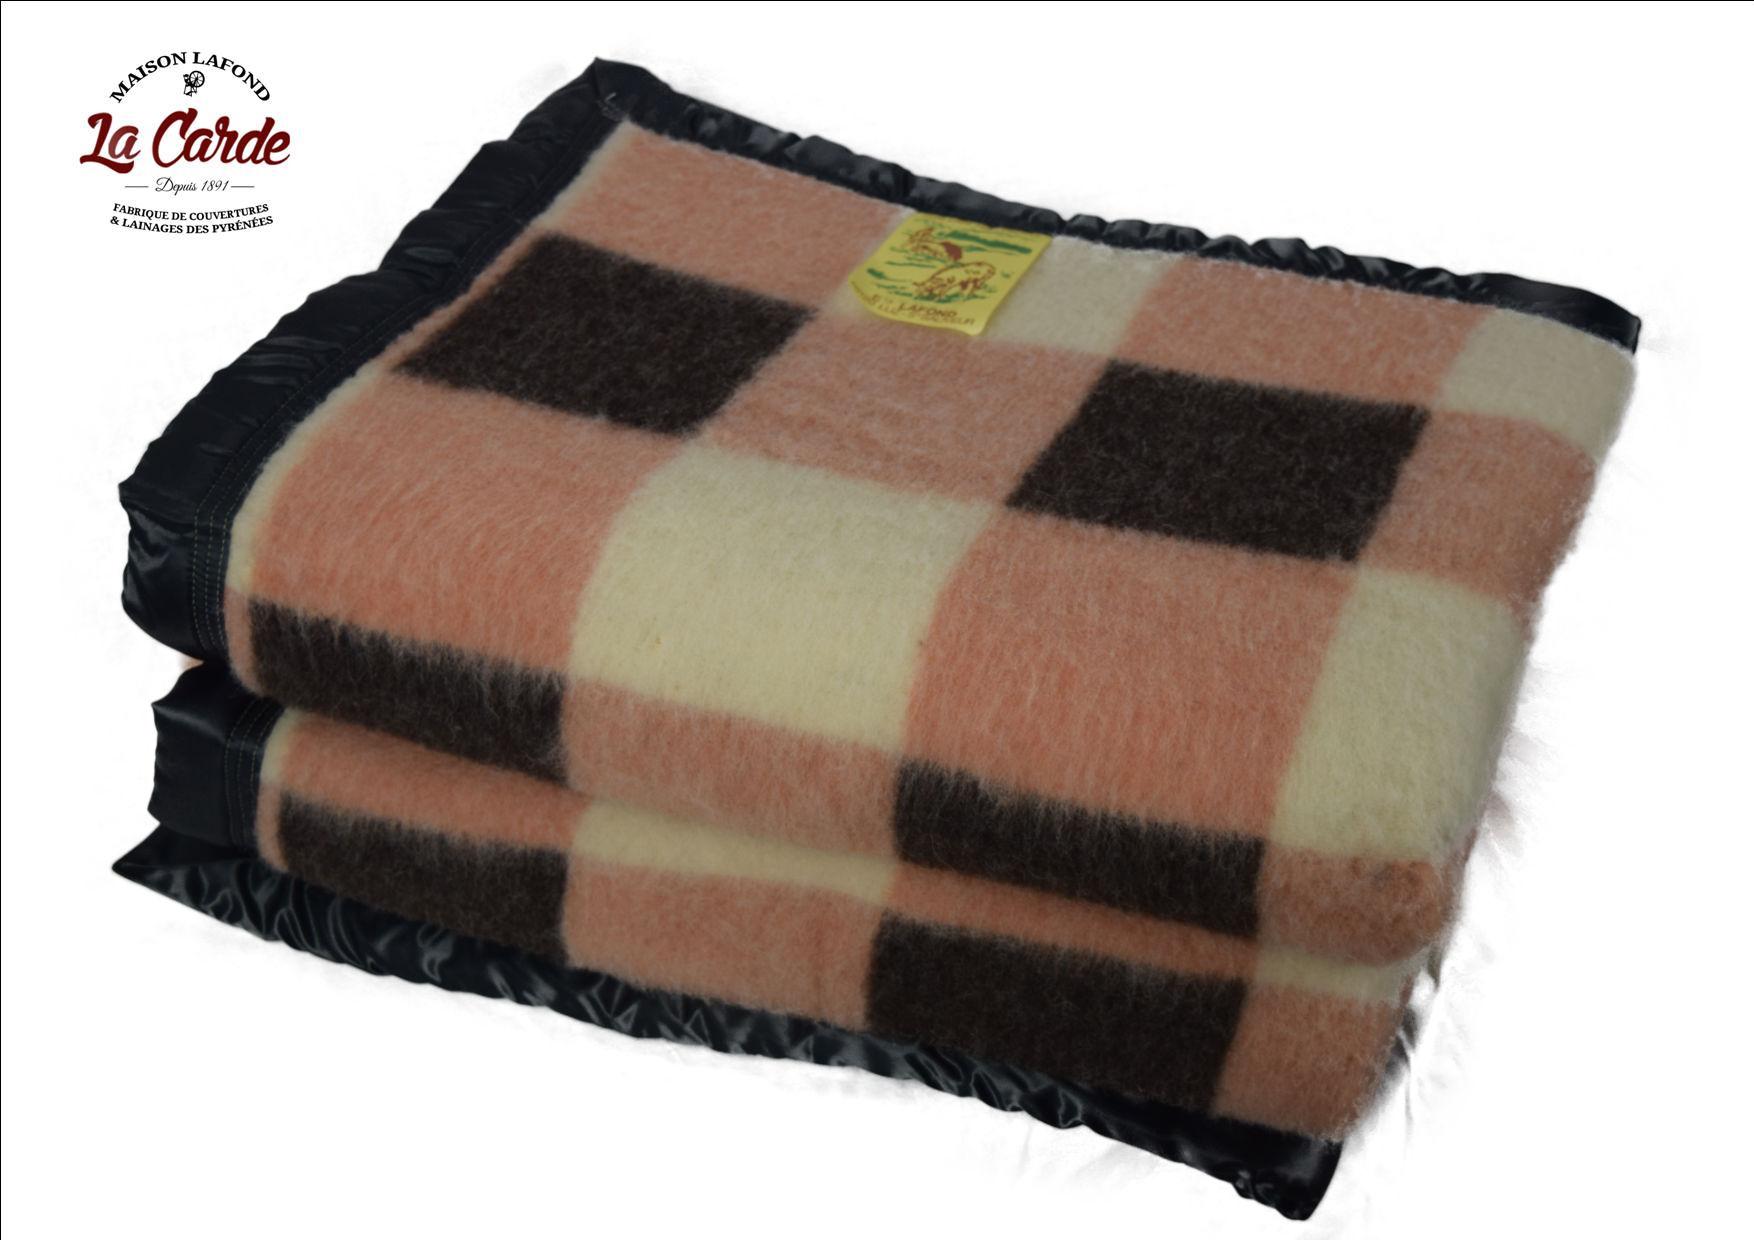 couverture en laine la carde des pyr n es. Black Bedroom Furniture Sets. Home Design Ideas